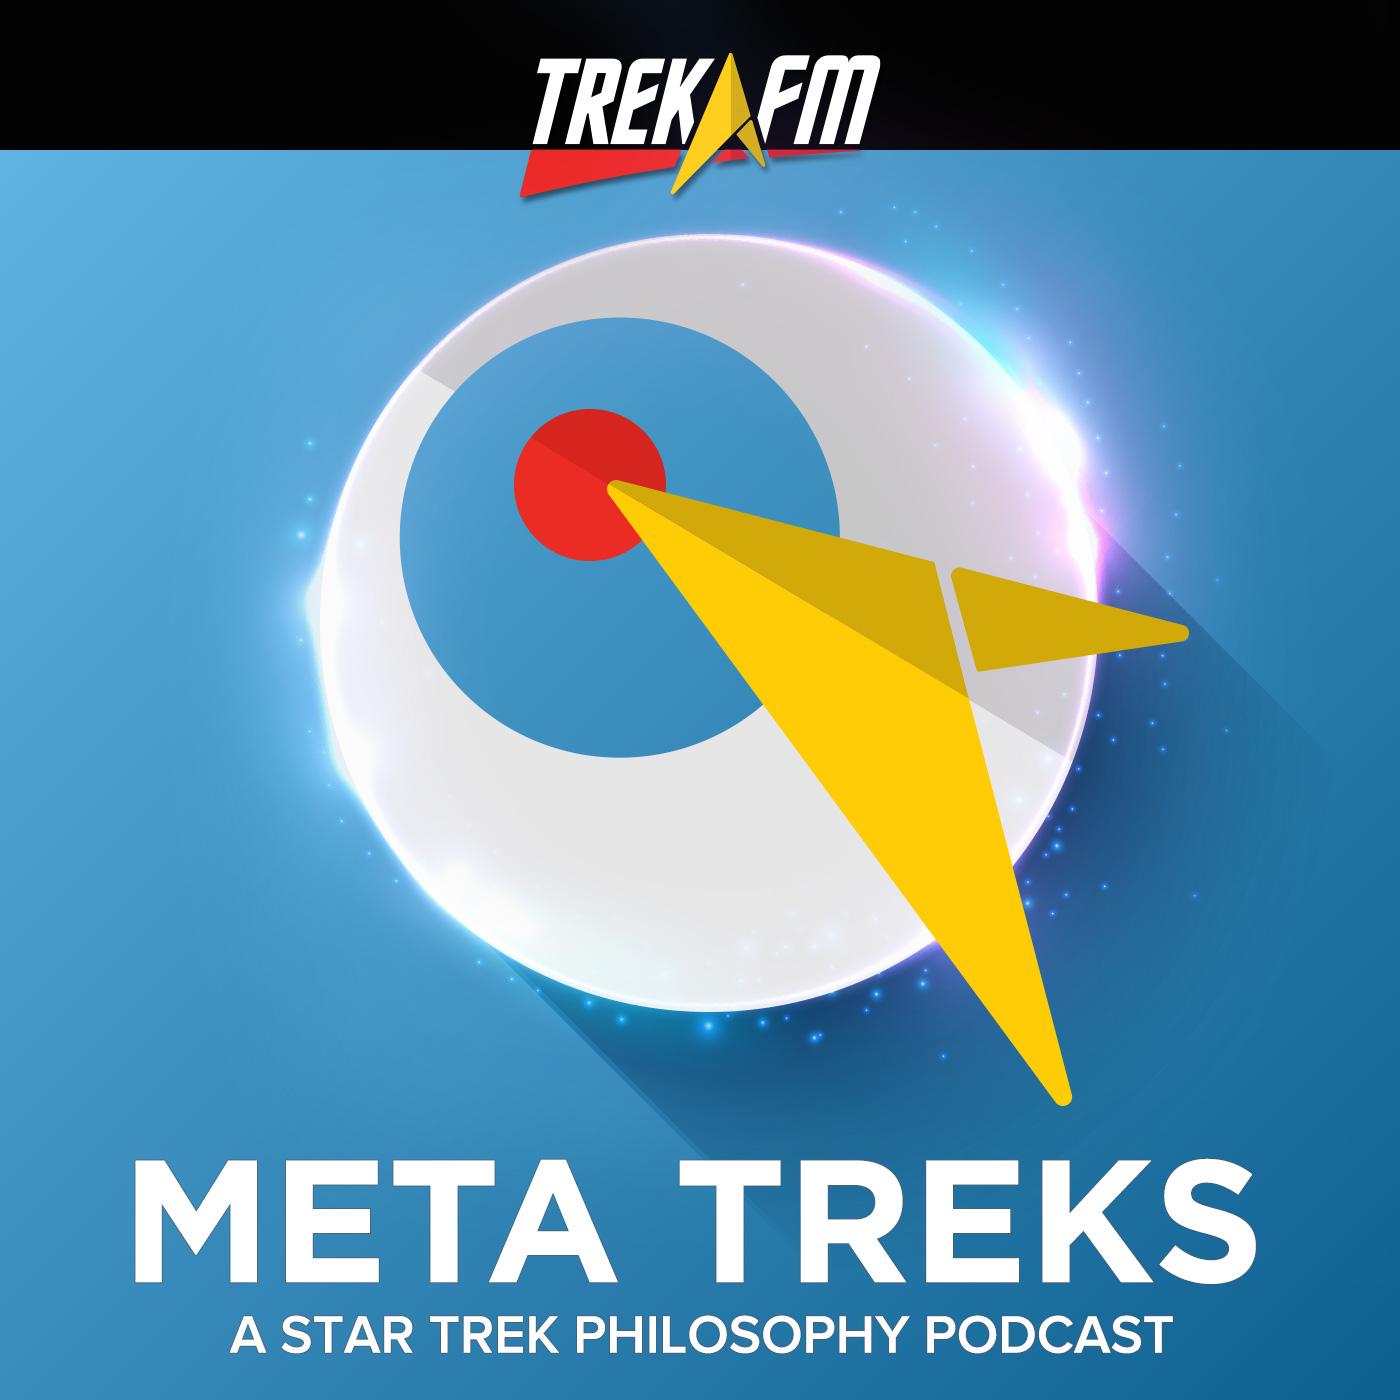 Meta Treks: A Star Trek Philosophy Podcast show art